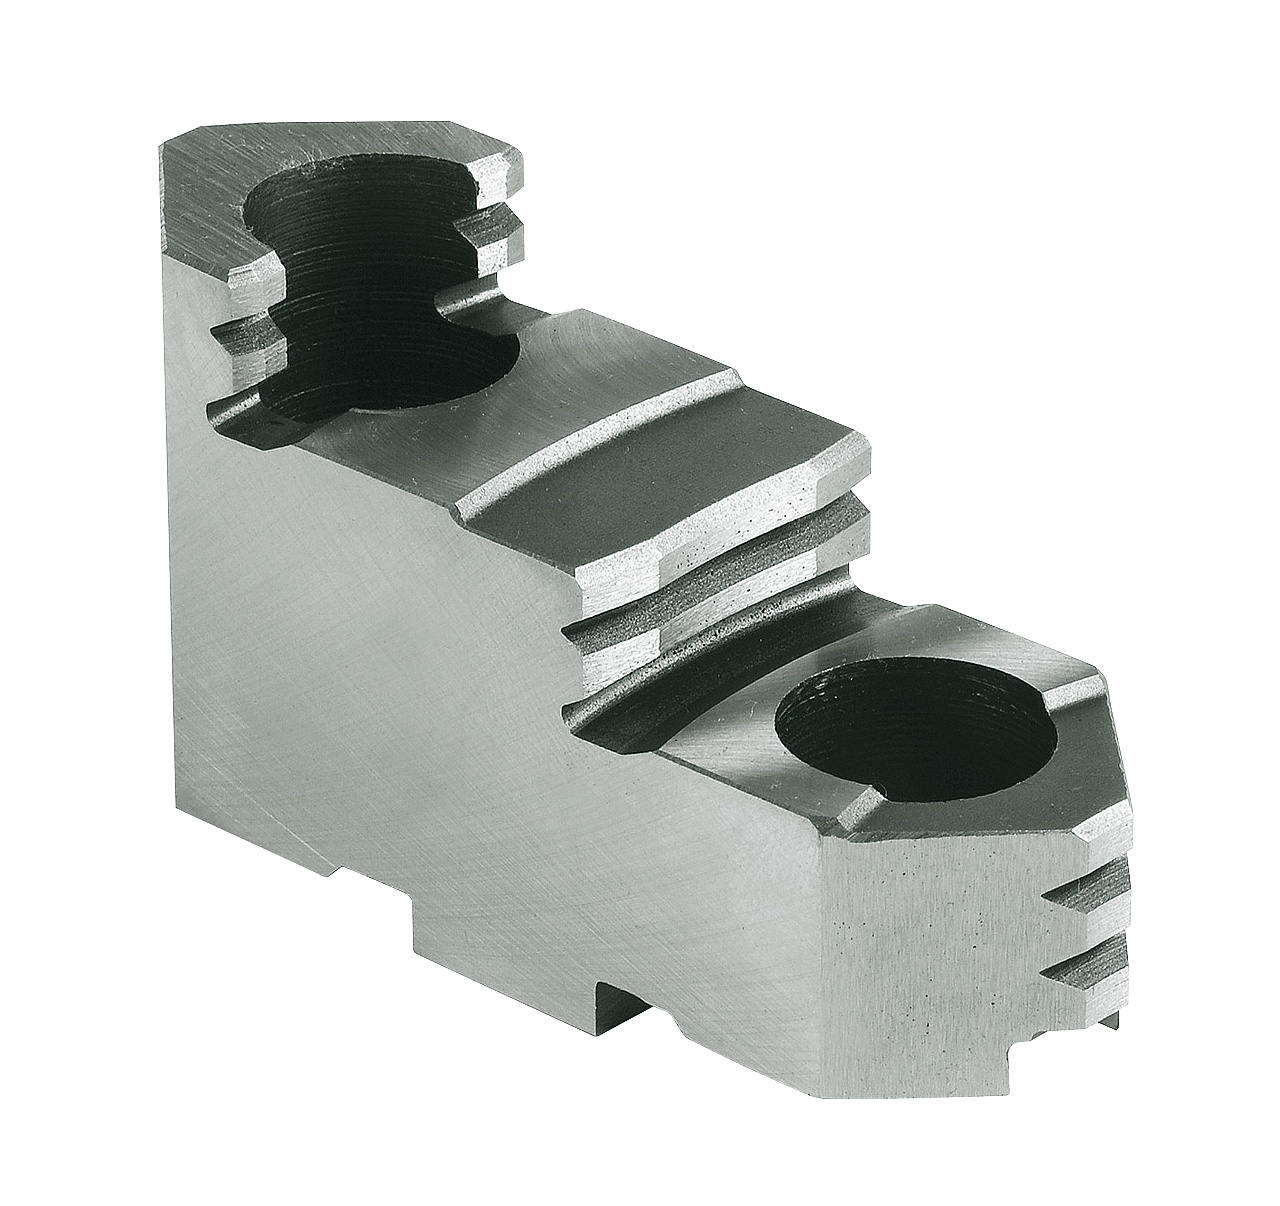 Szczęki górne twarde - kompleth TJ-PS4-400 BERNARDO